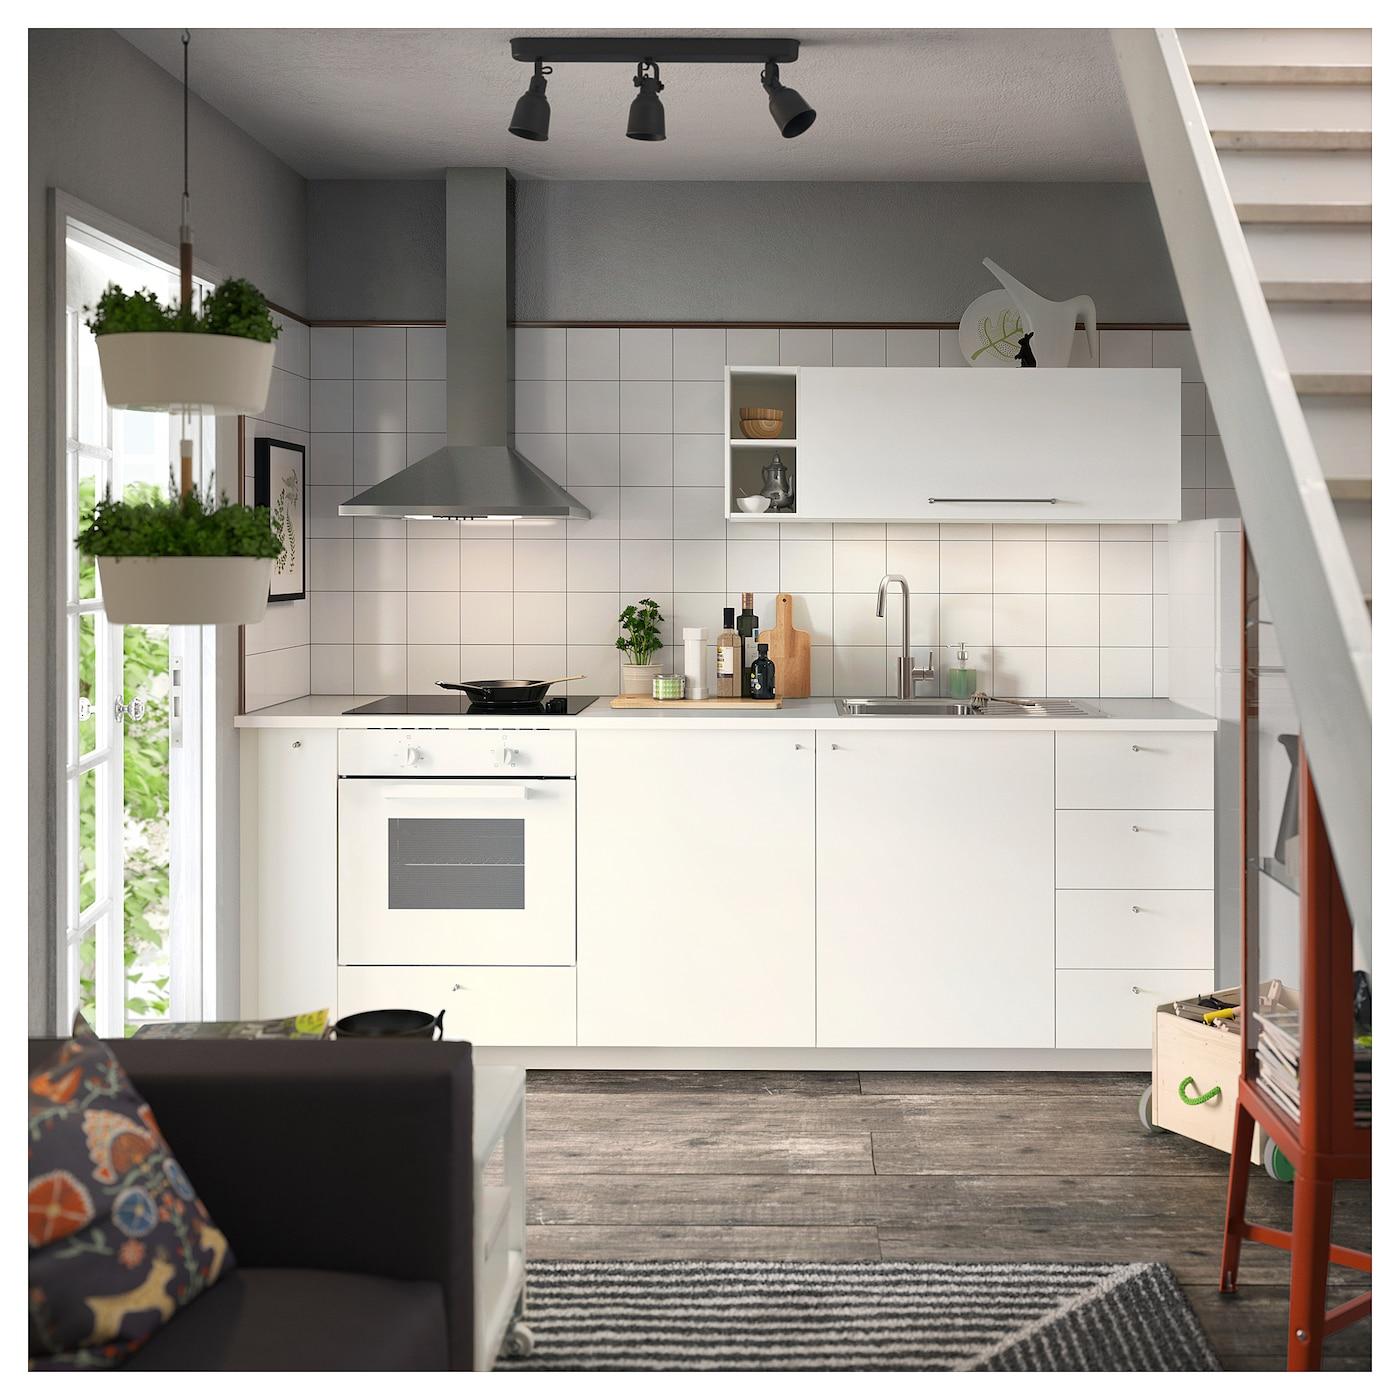 Lilltrask Arbeitsplatte Weiss Laminat Ikea Deutschland